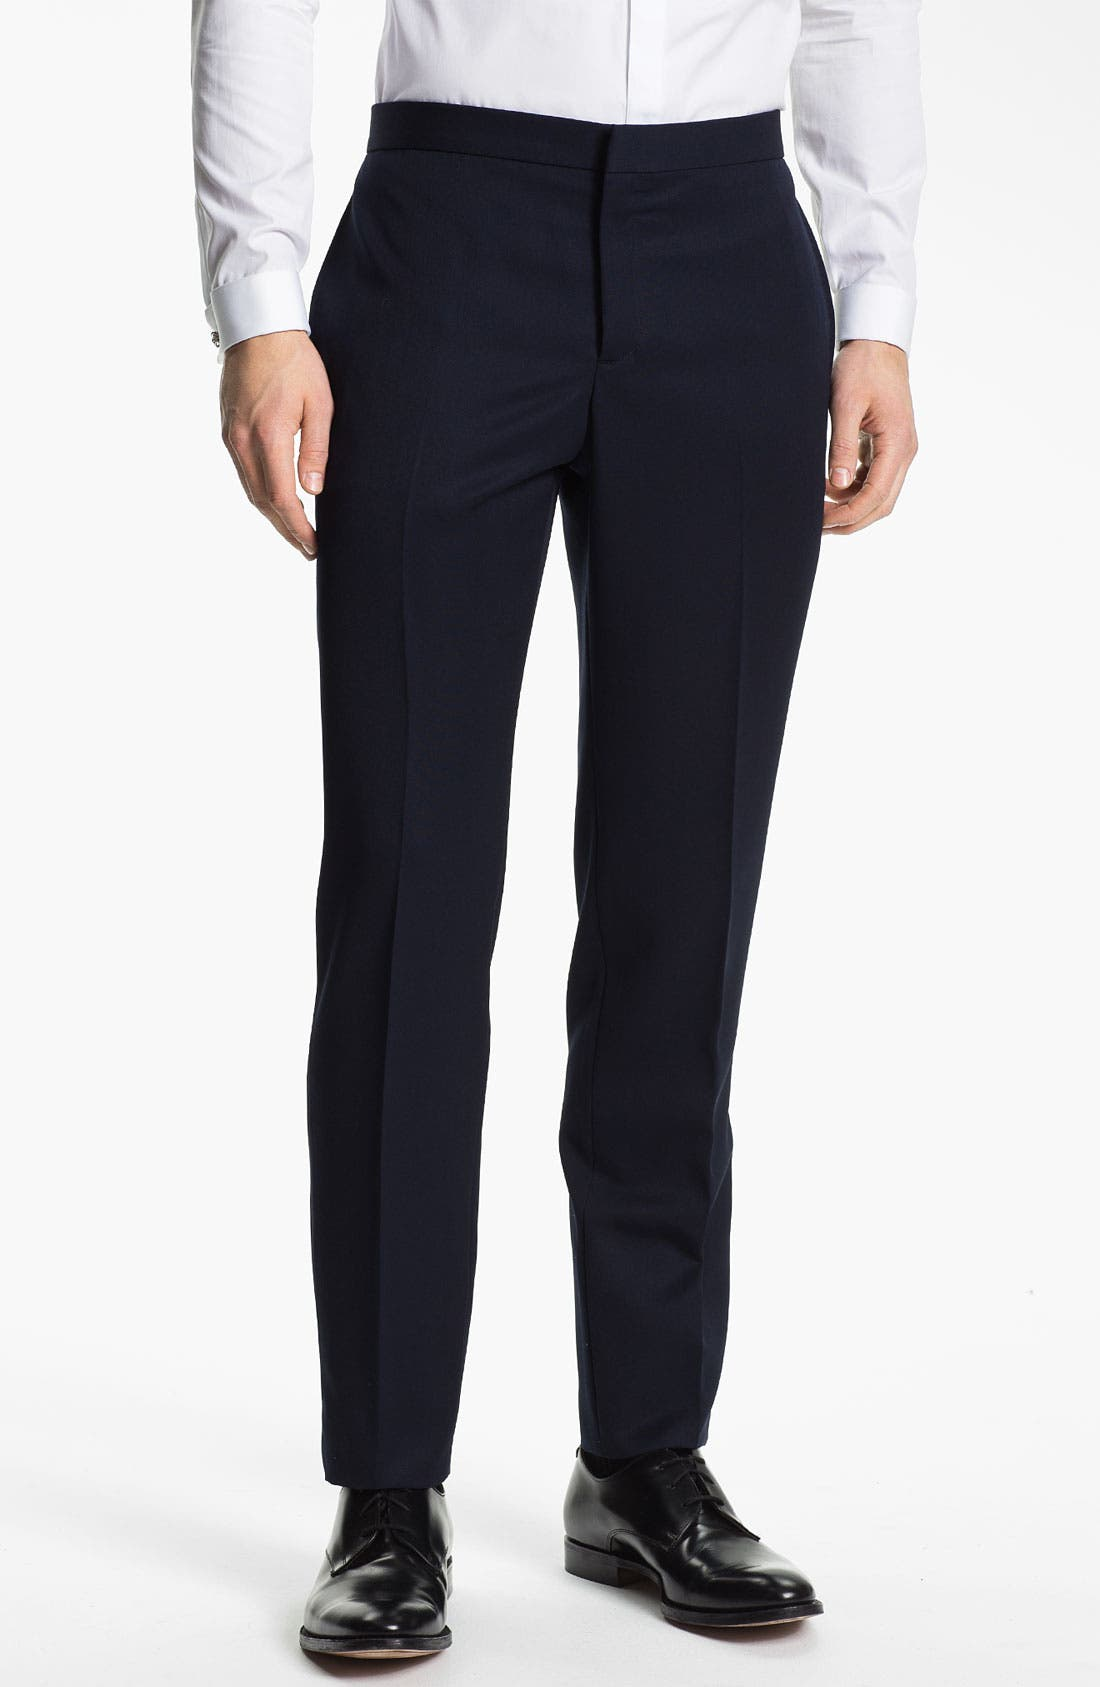 Main Image - Burberry Prorsum Wool Tuxedo Pants